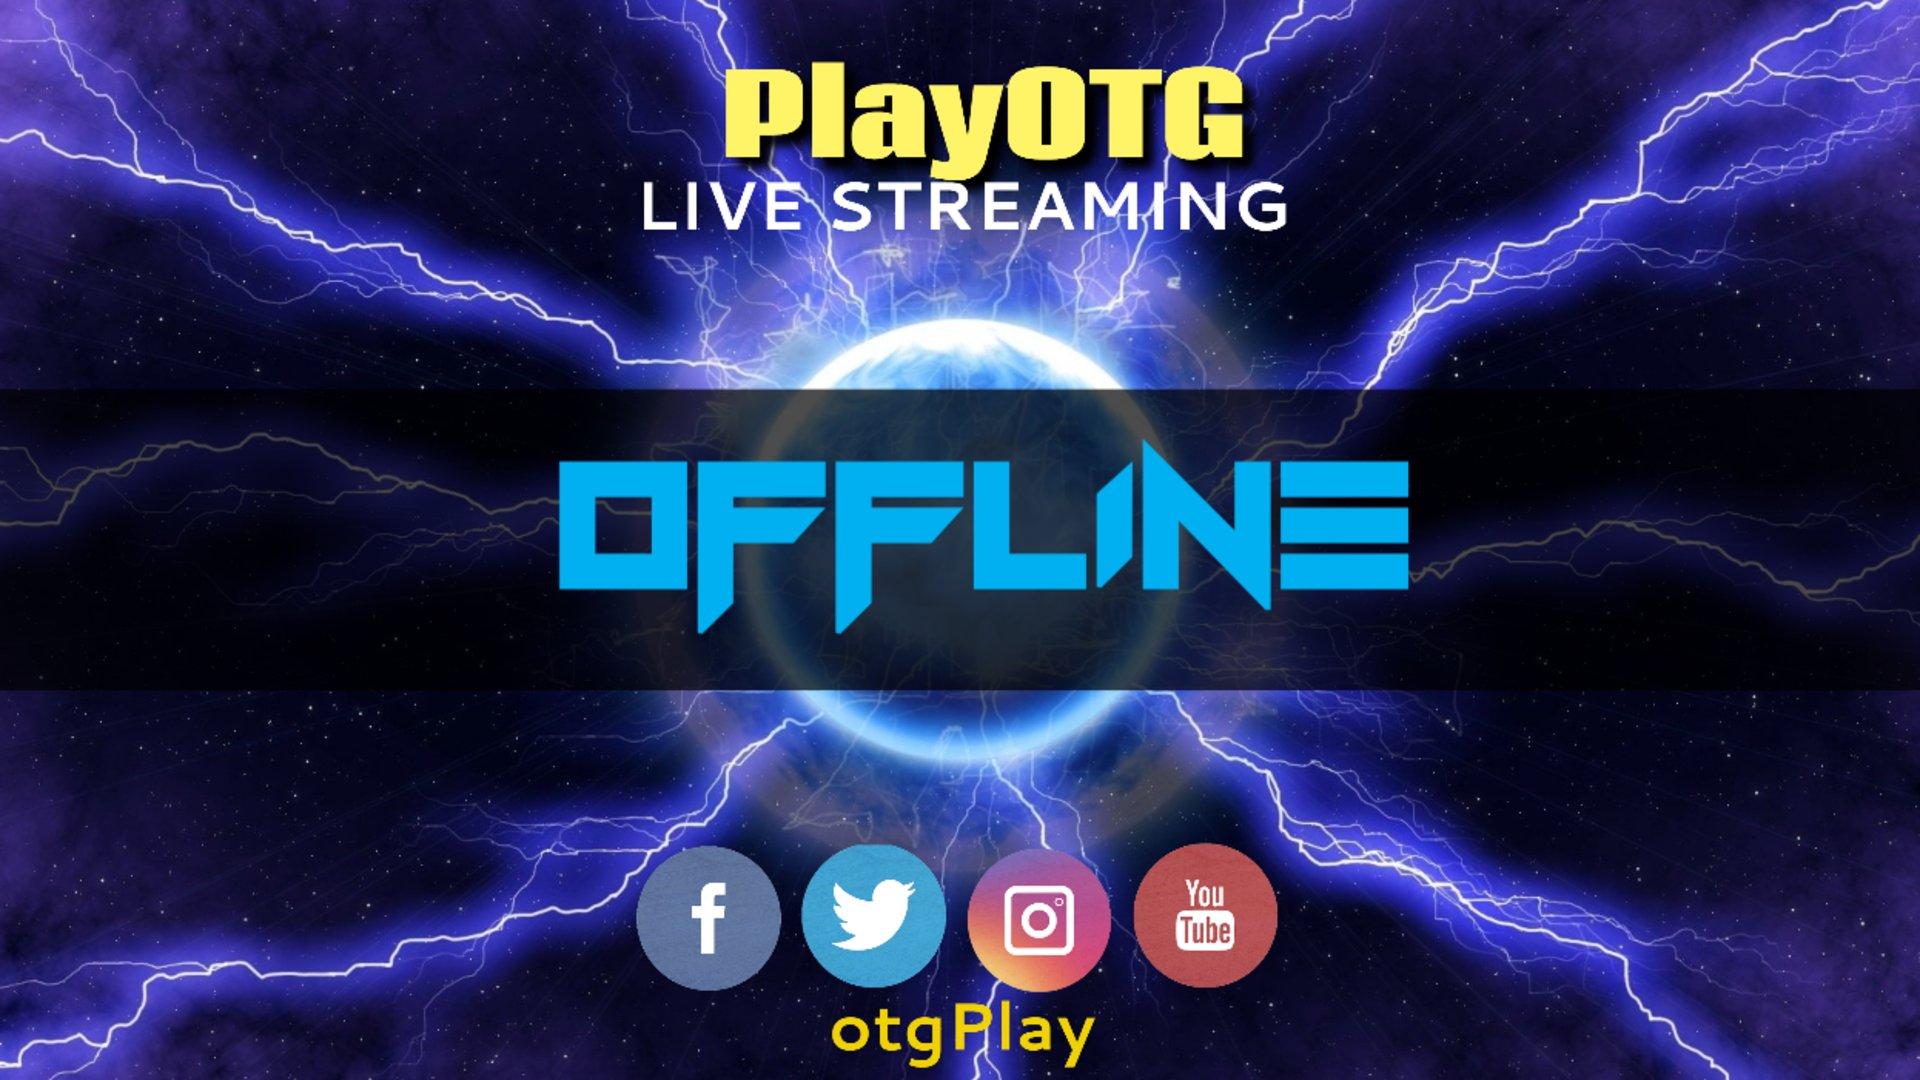 Twitch stream of PlayOTG